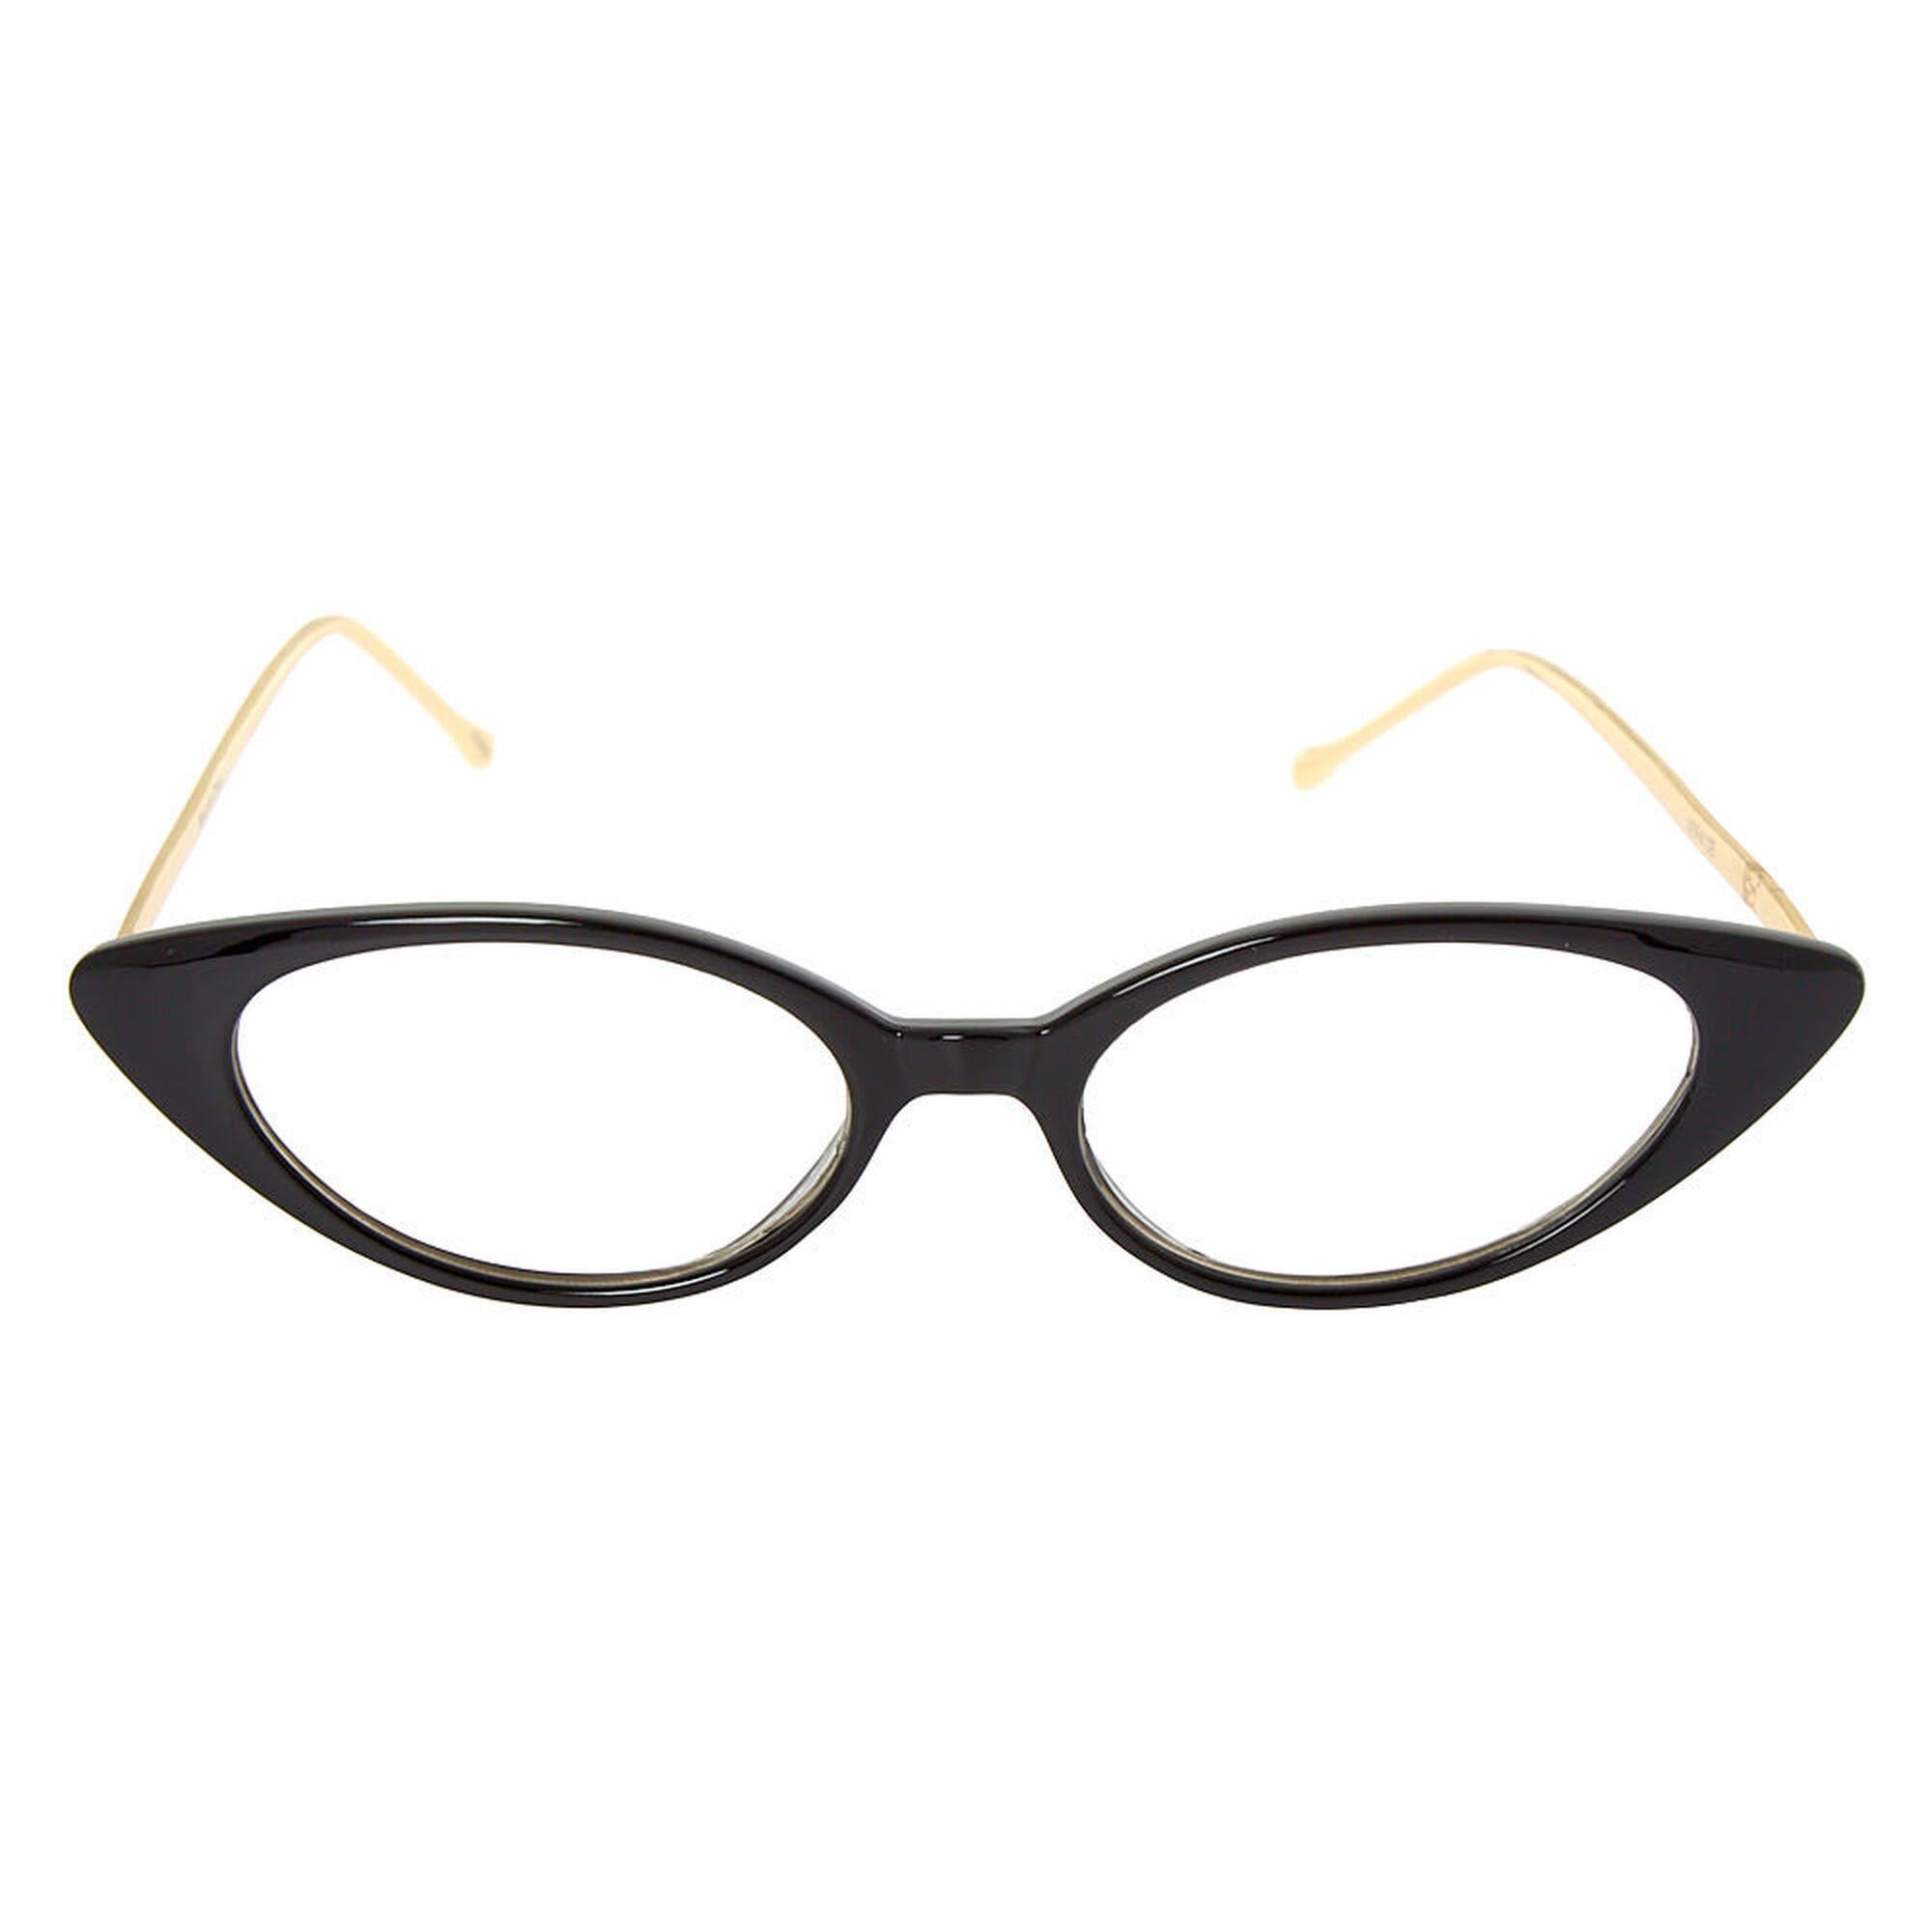 a4fb19a5e76 ... Extreme Cat Eye Frames - Black